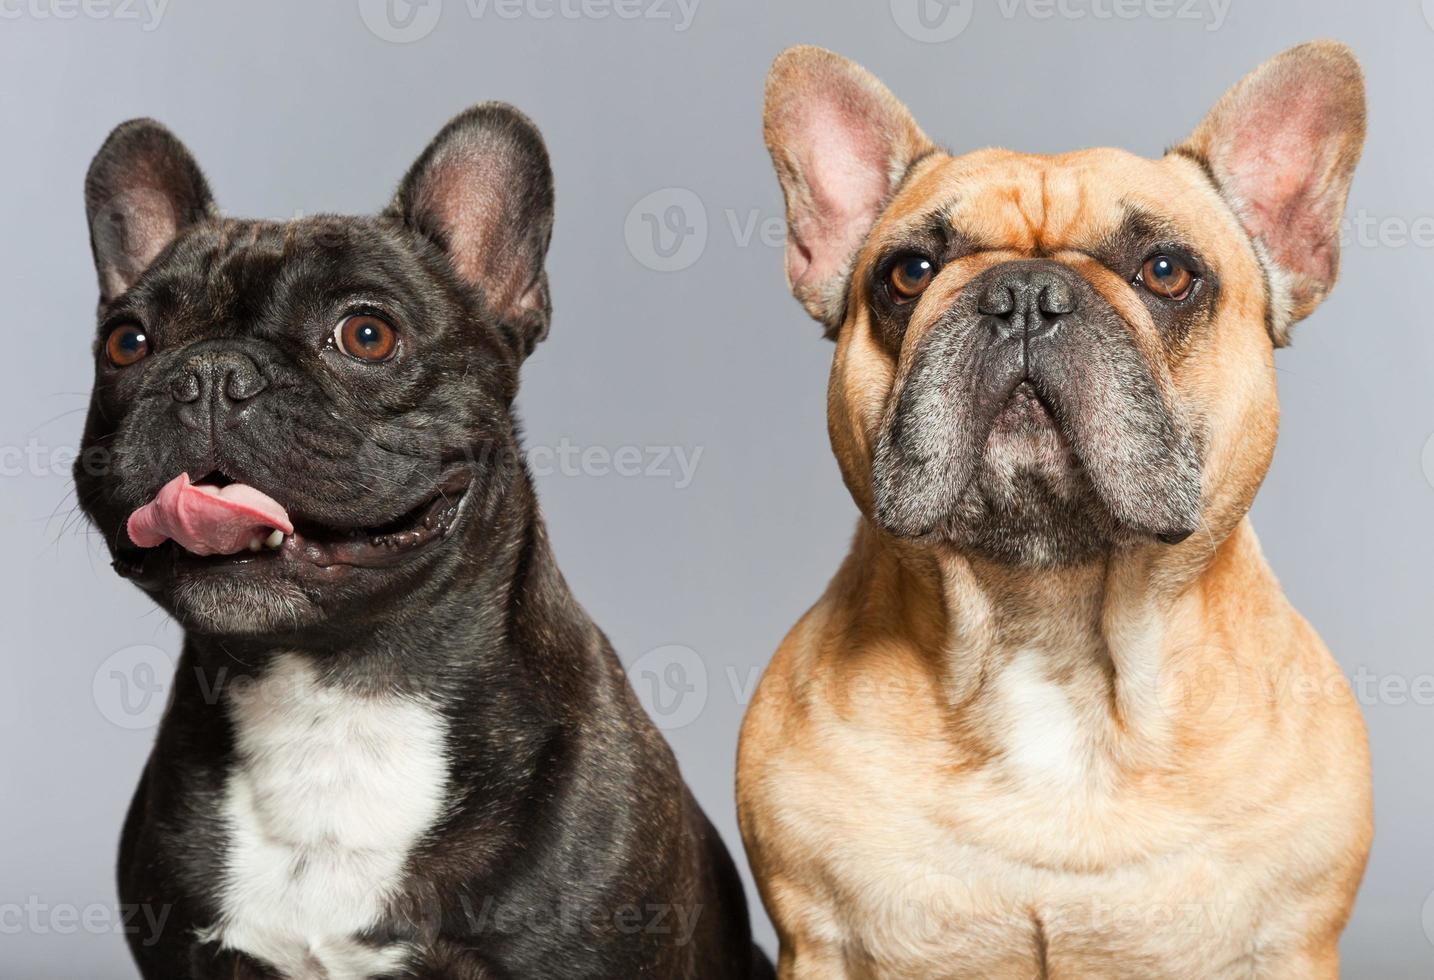 zwarte en bruine Franse buldoggen samen. grappige honden. foto